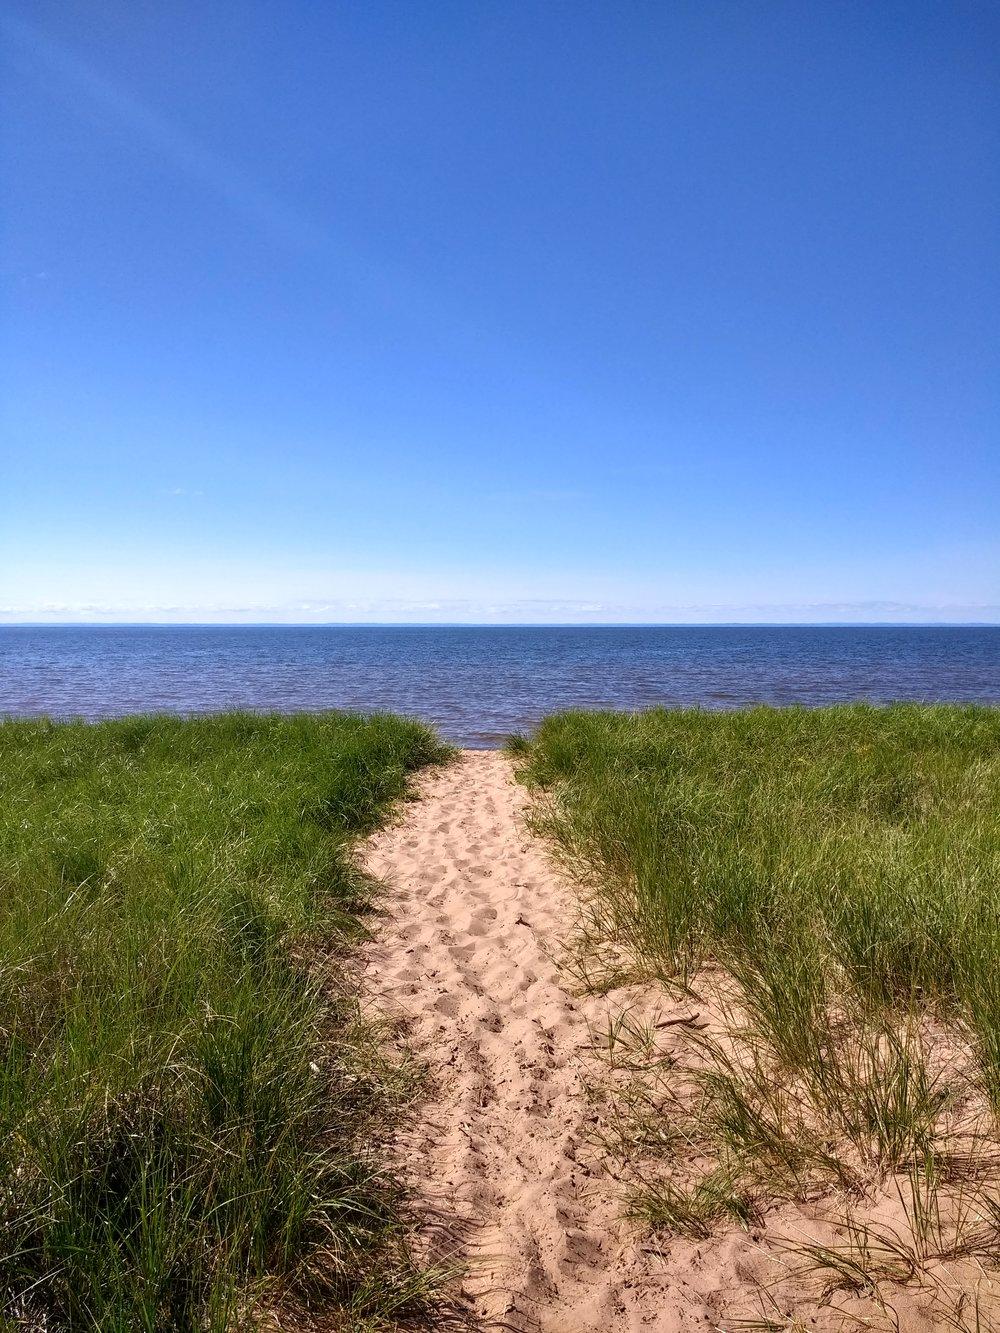 Lake Superior Corny Beach IMG_20180802_161638198_HDR.jpg